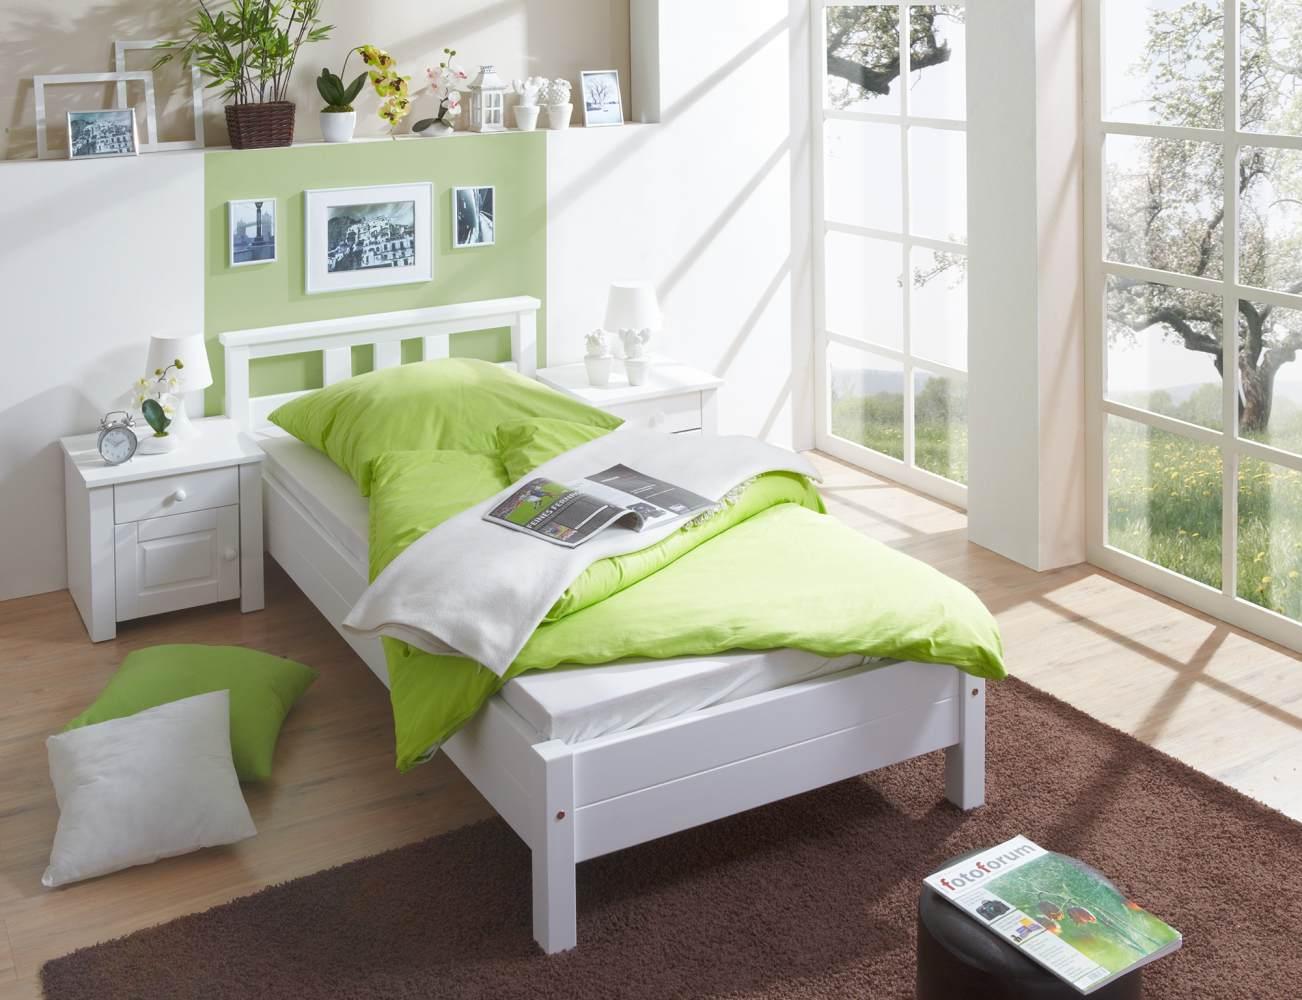 Ticaa 'Merci' Einzelbett 100x200 weiß Bild 1